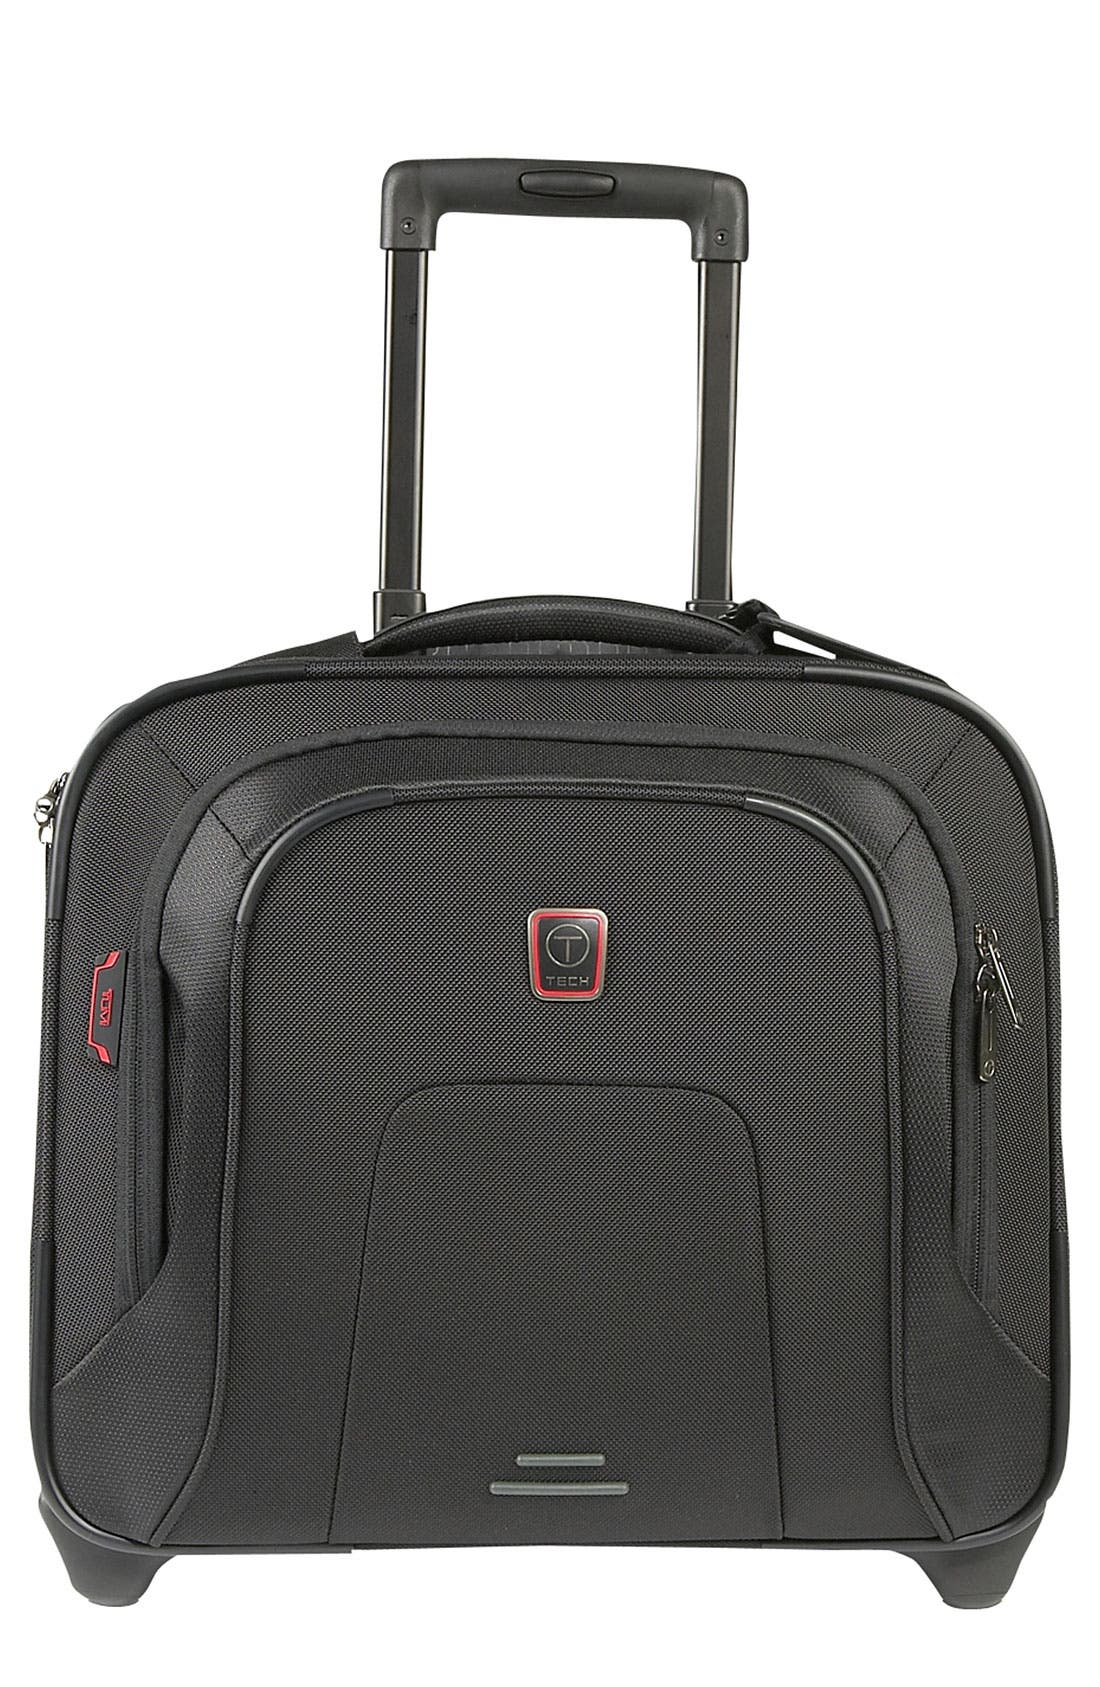 Alternate Image 1 Selected - T-Tech by Tumi 'Presidio MacArthur' Wheeled Compact Laptop Briefcase